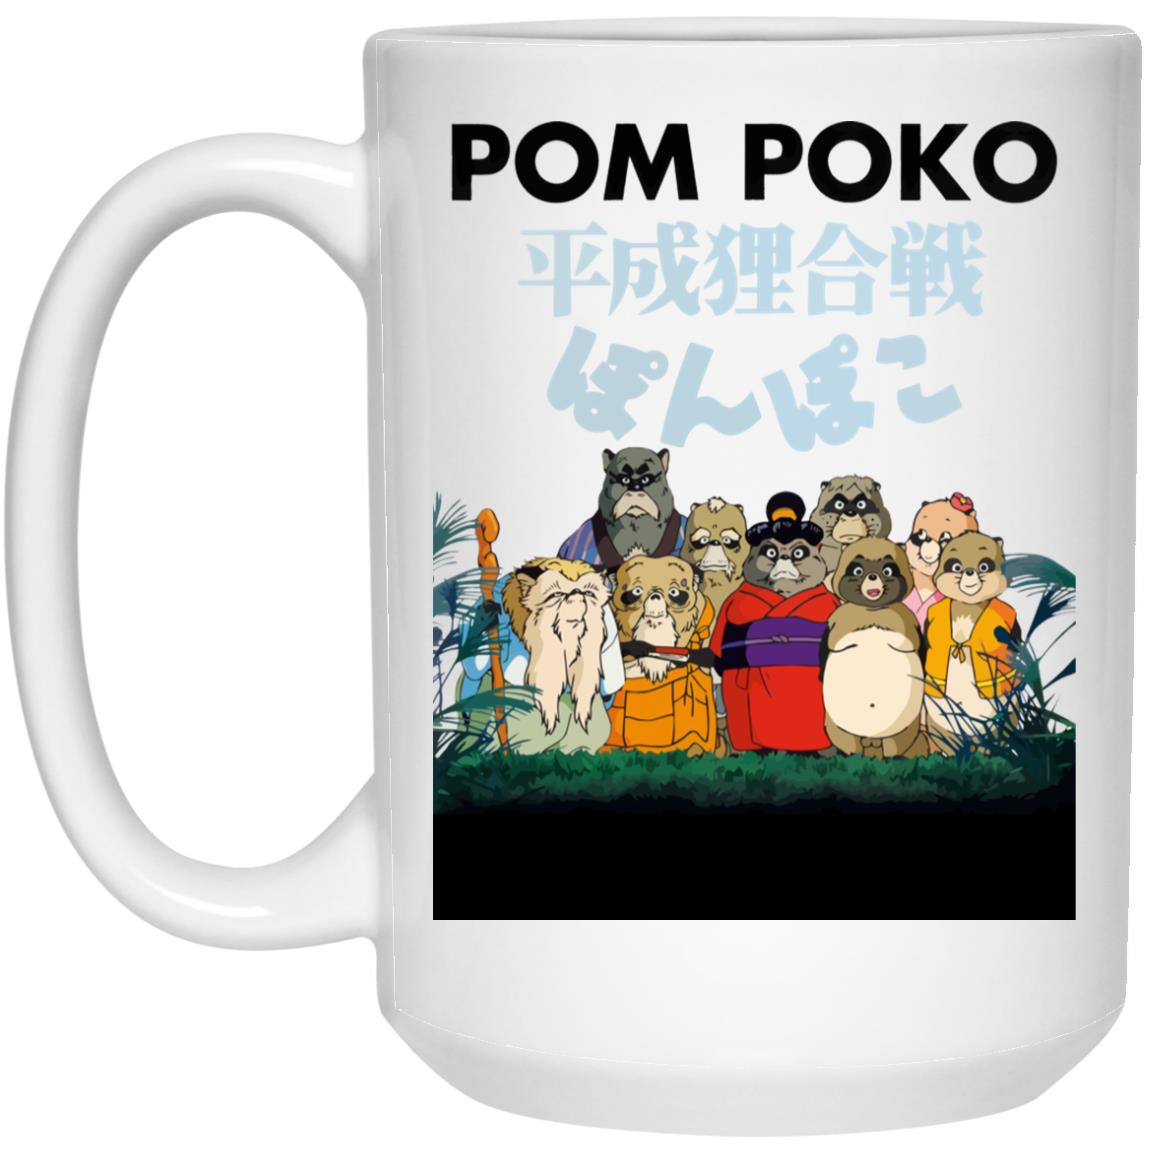 Pom Poko Poster Japanese Mug